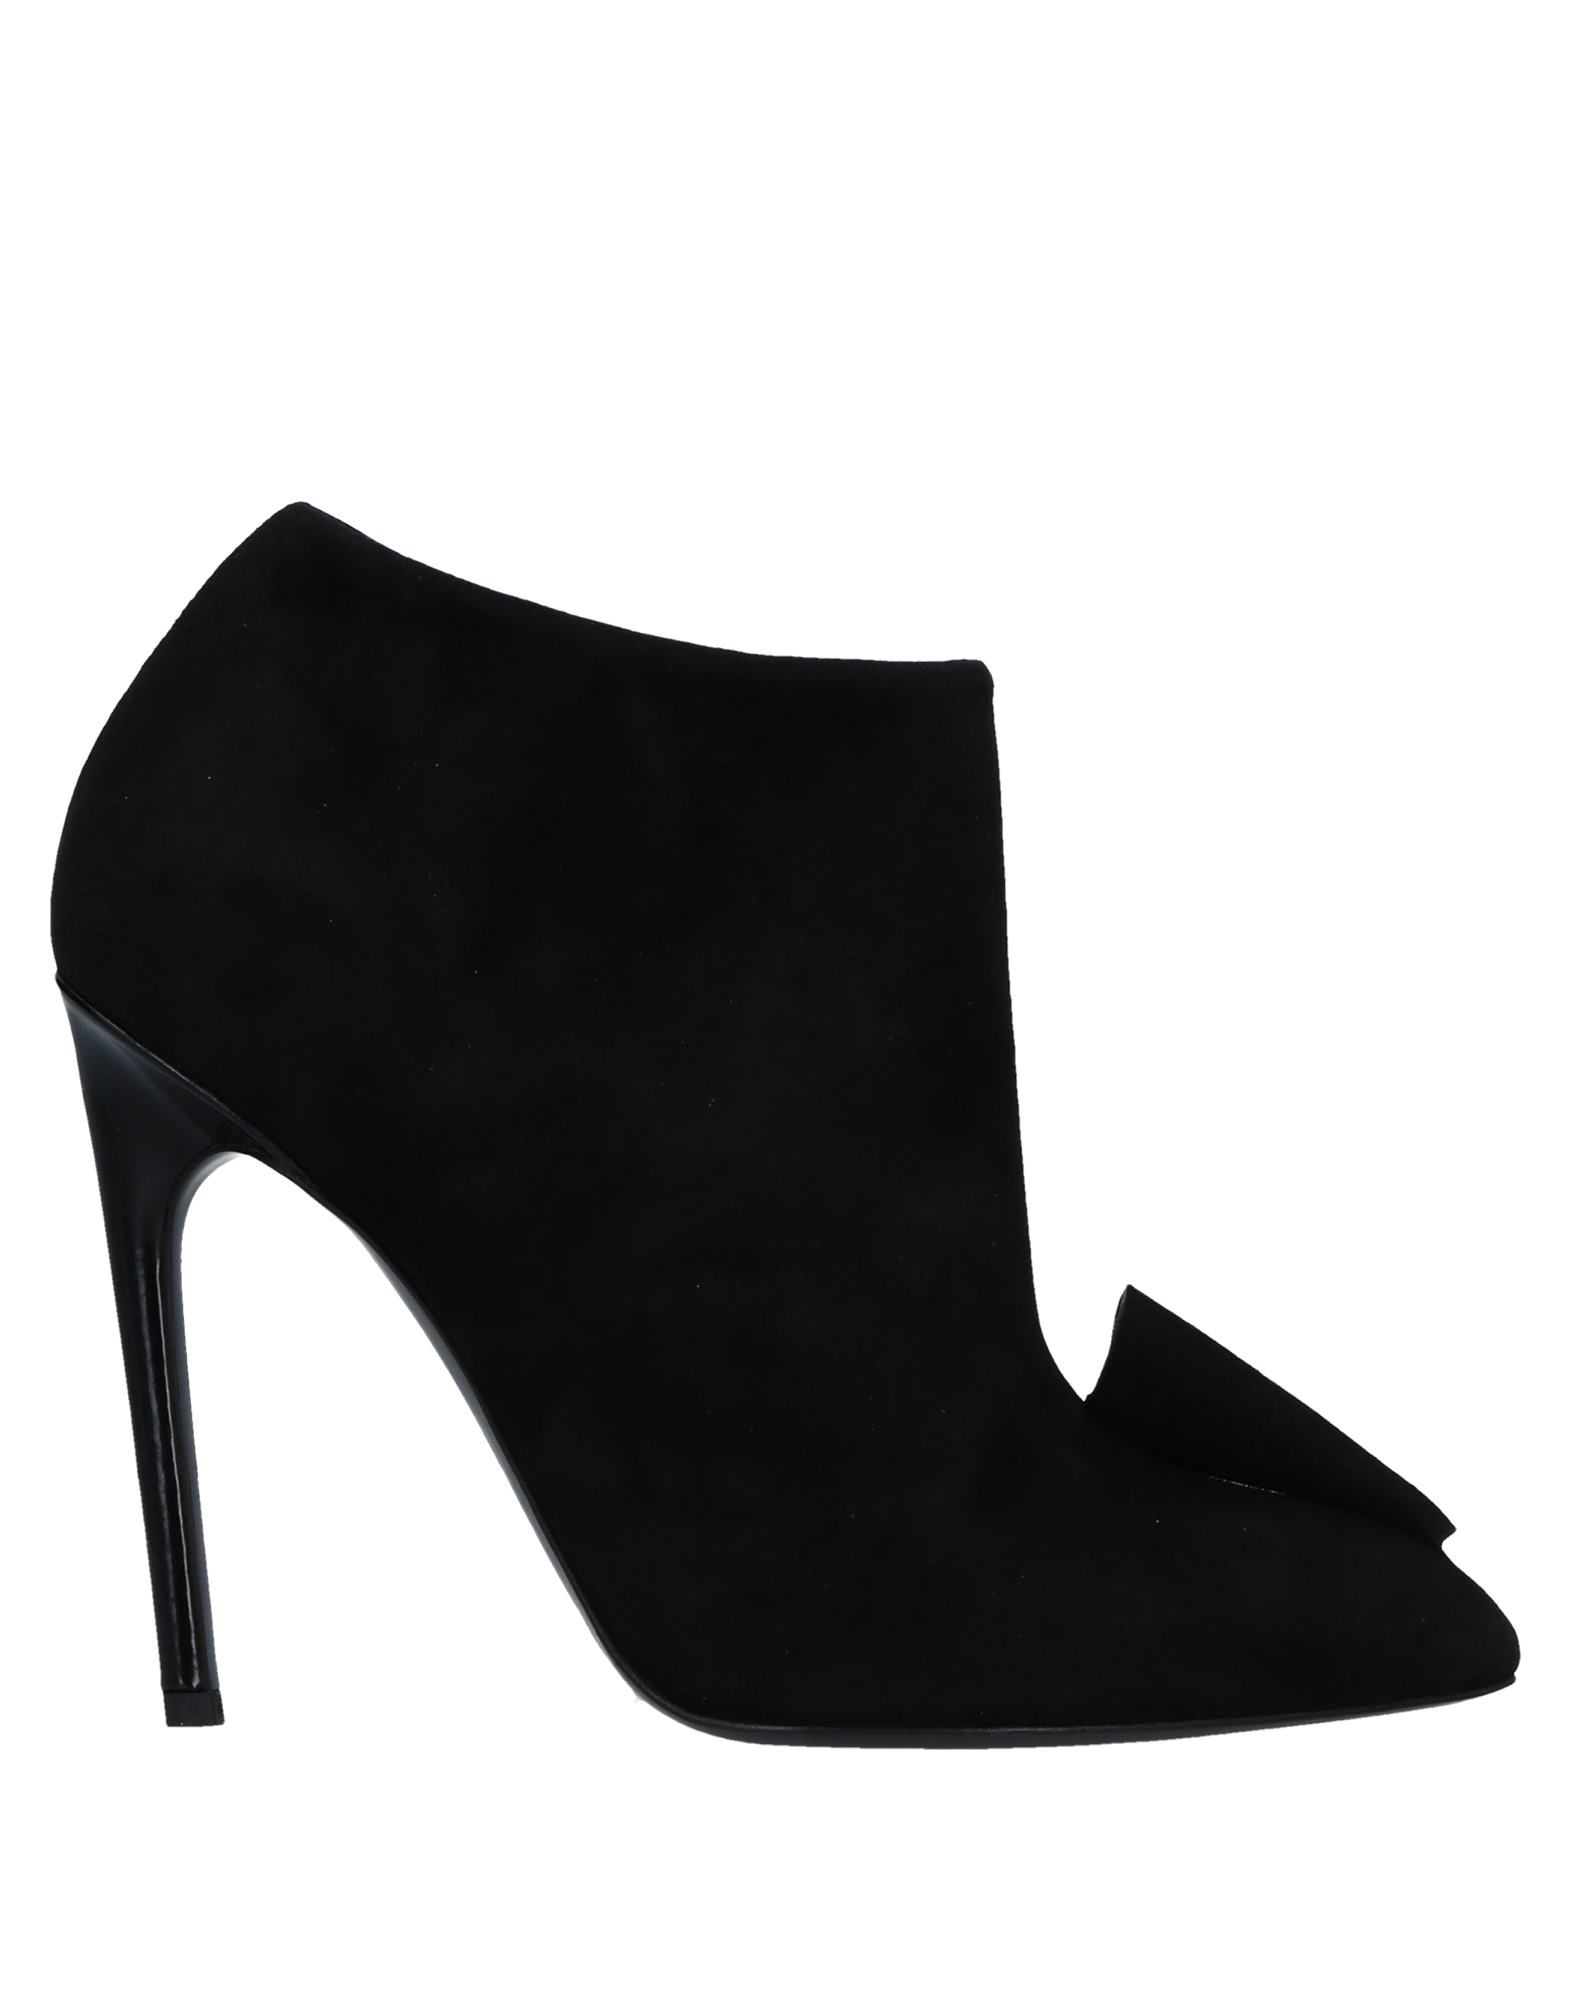 ALAIN TONDOWSKI Ankle Boot in Black